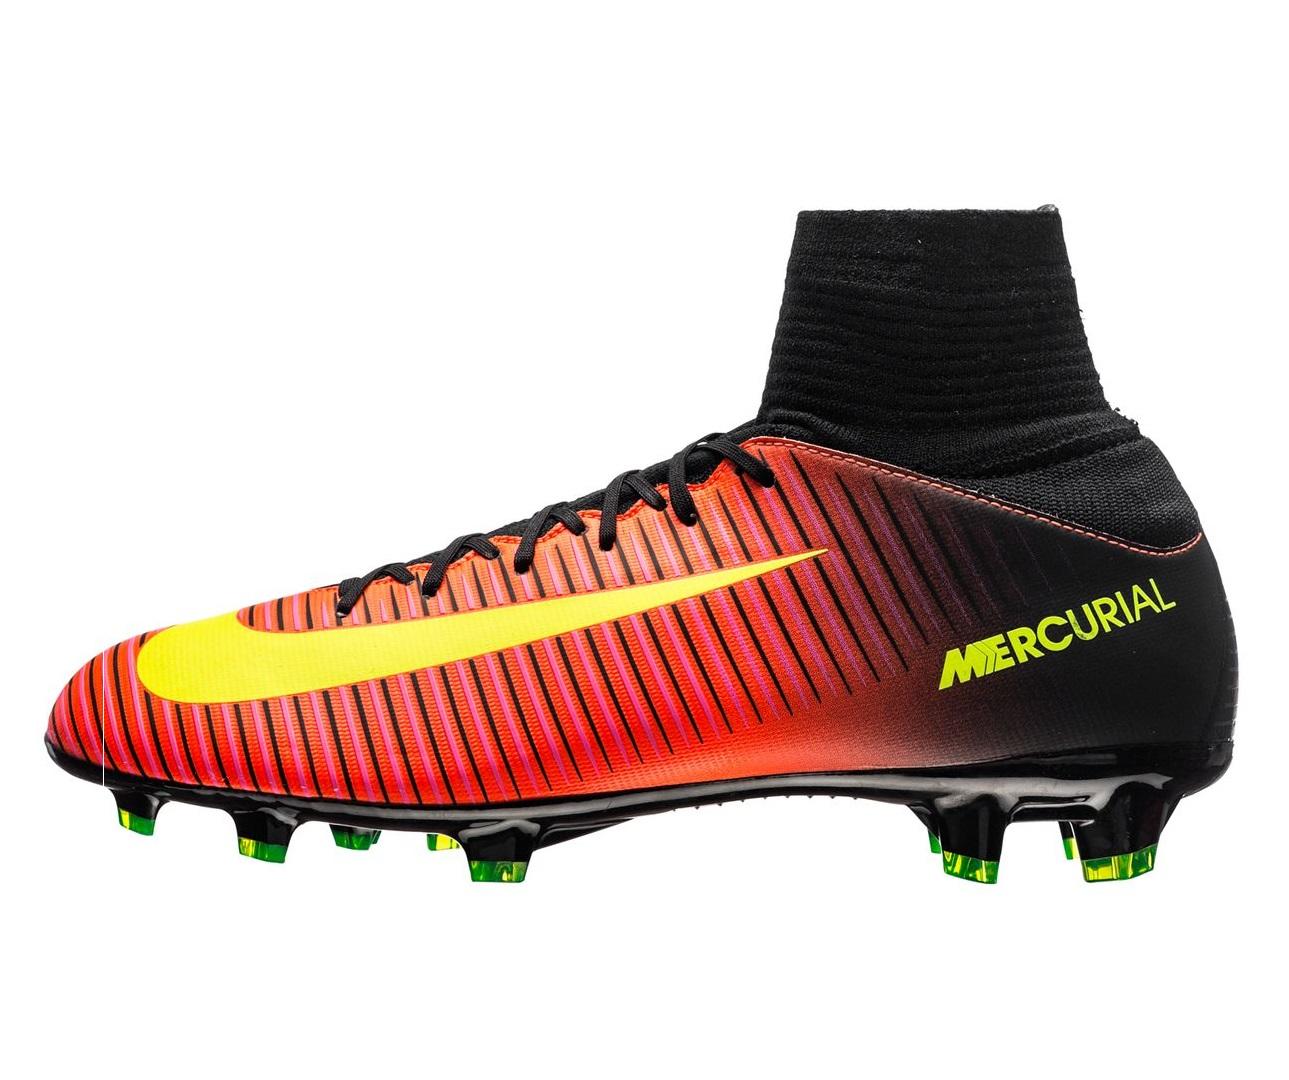 Бутсы Nike Mercurial Superfly V FG Total Crimson Volt Black Kids f70d77b056a2c